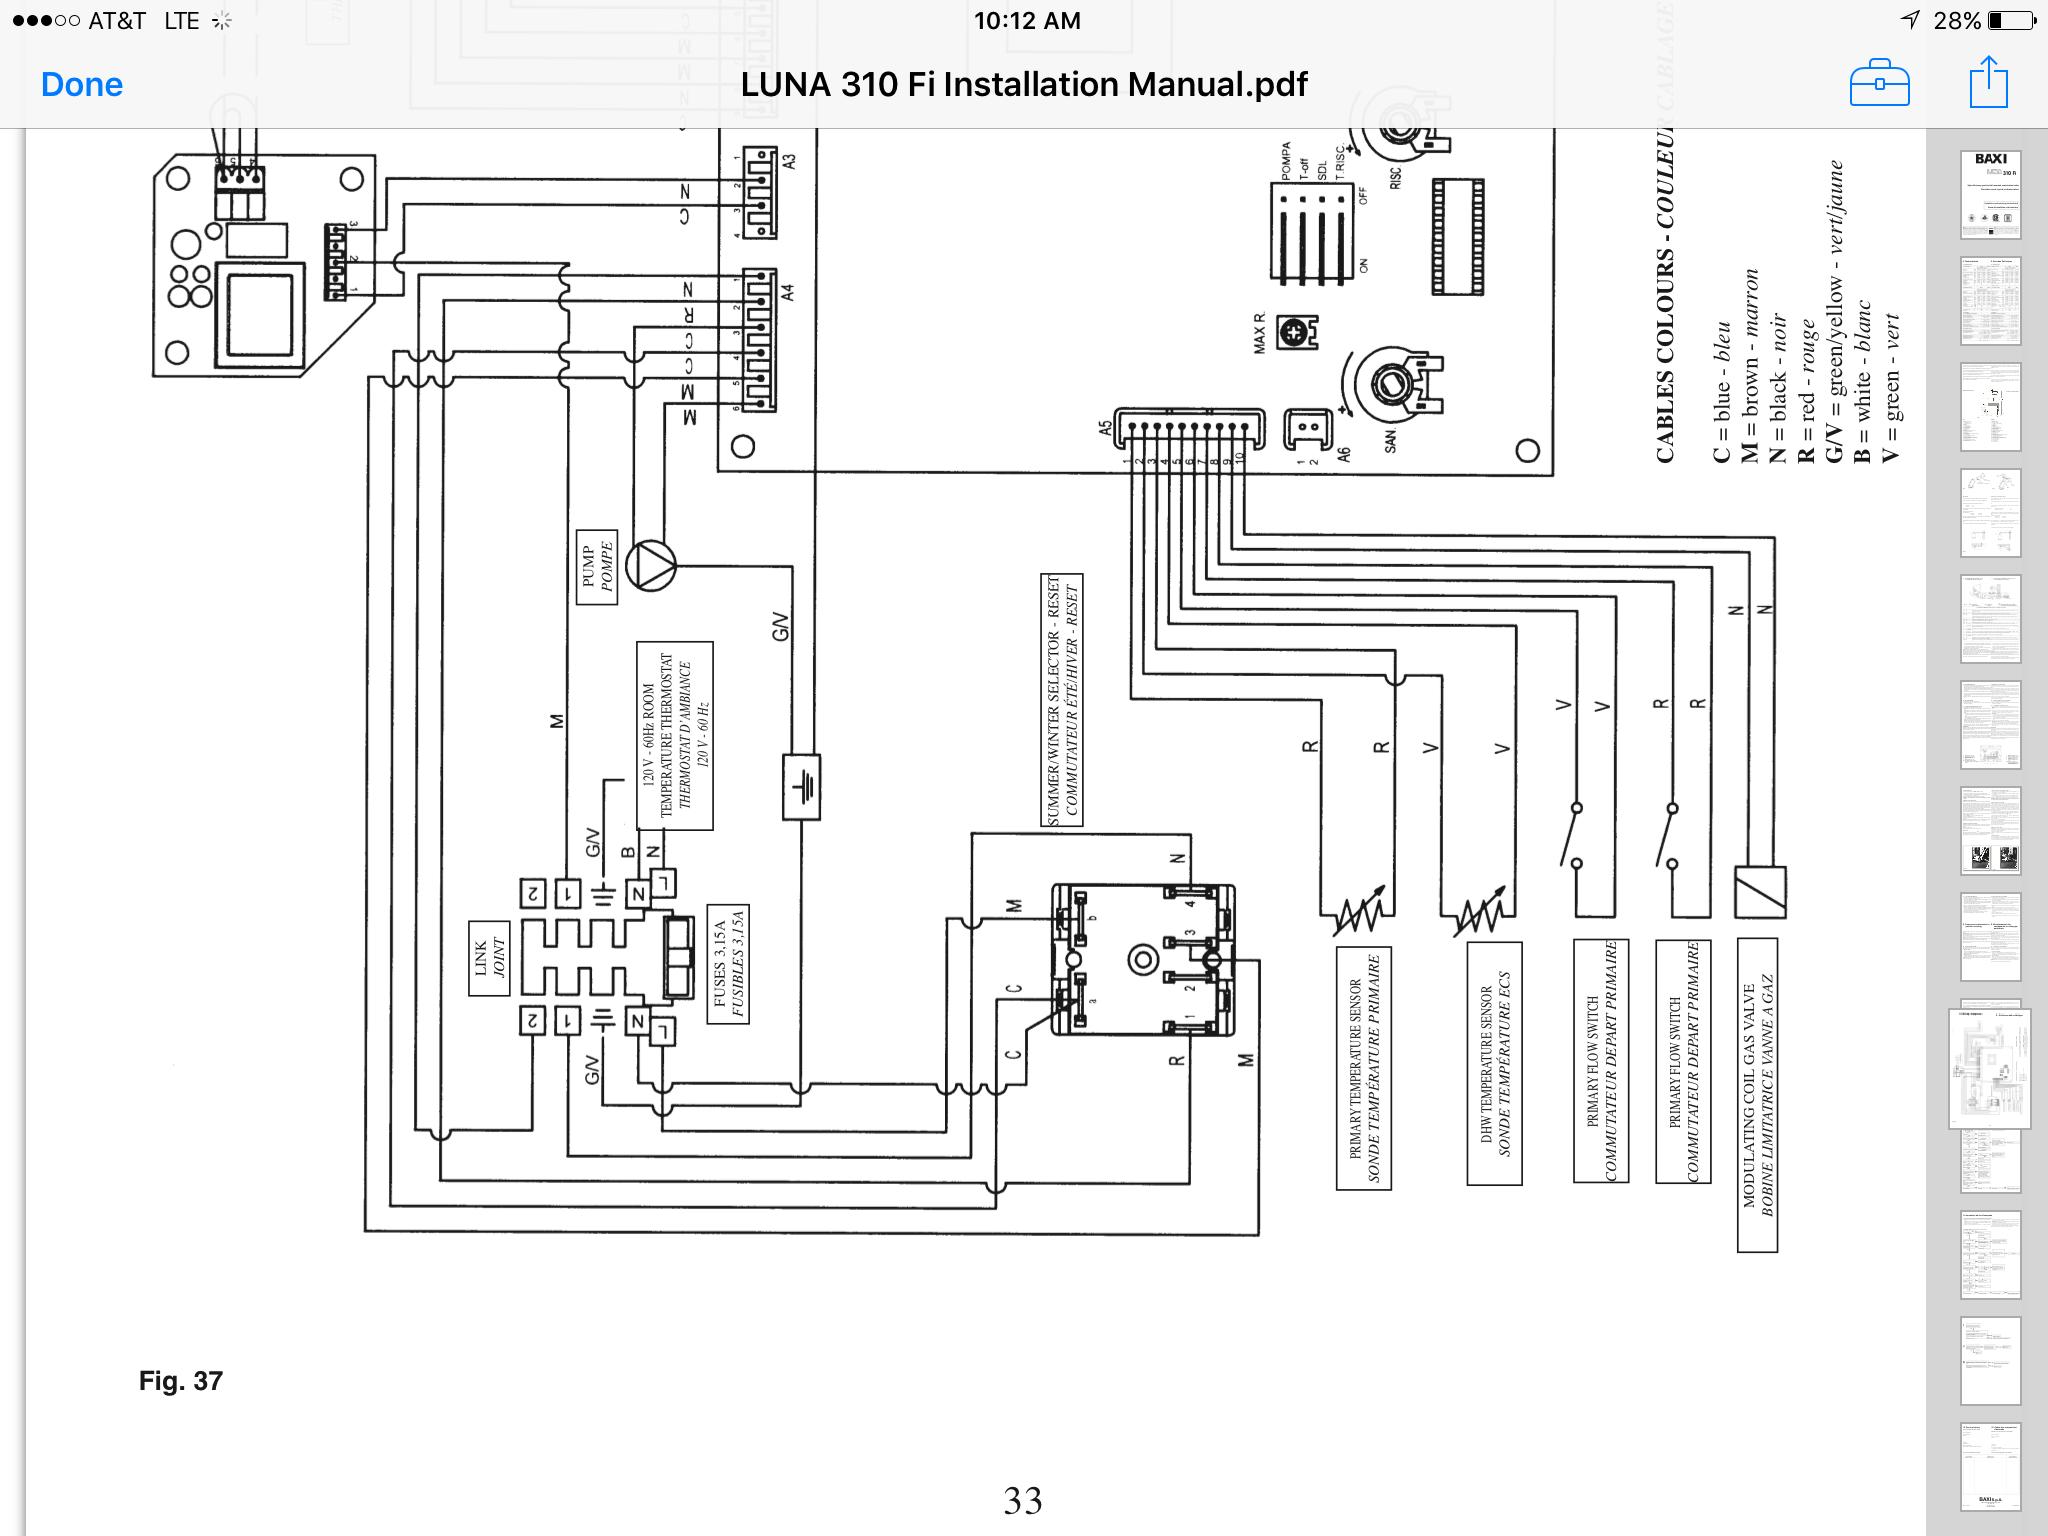 Baxi luna 310 — Heating Help: The Wall | Baxi Luna 3 Piping Diagram |  | Heating Help: The Wall